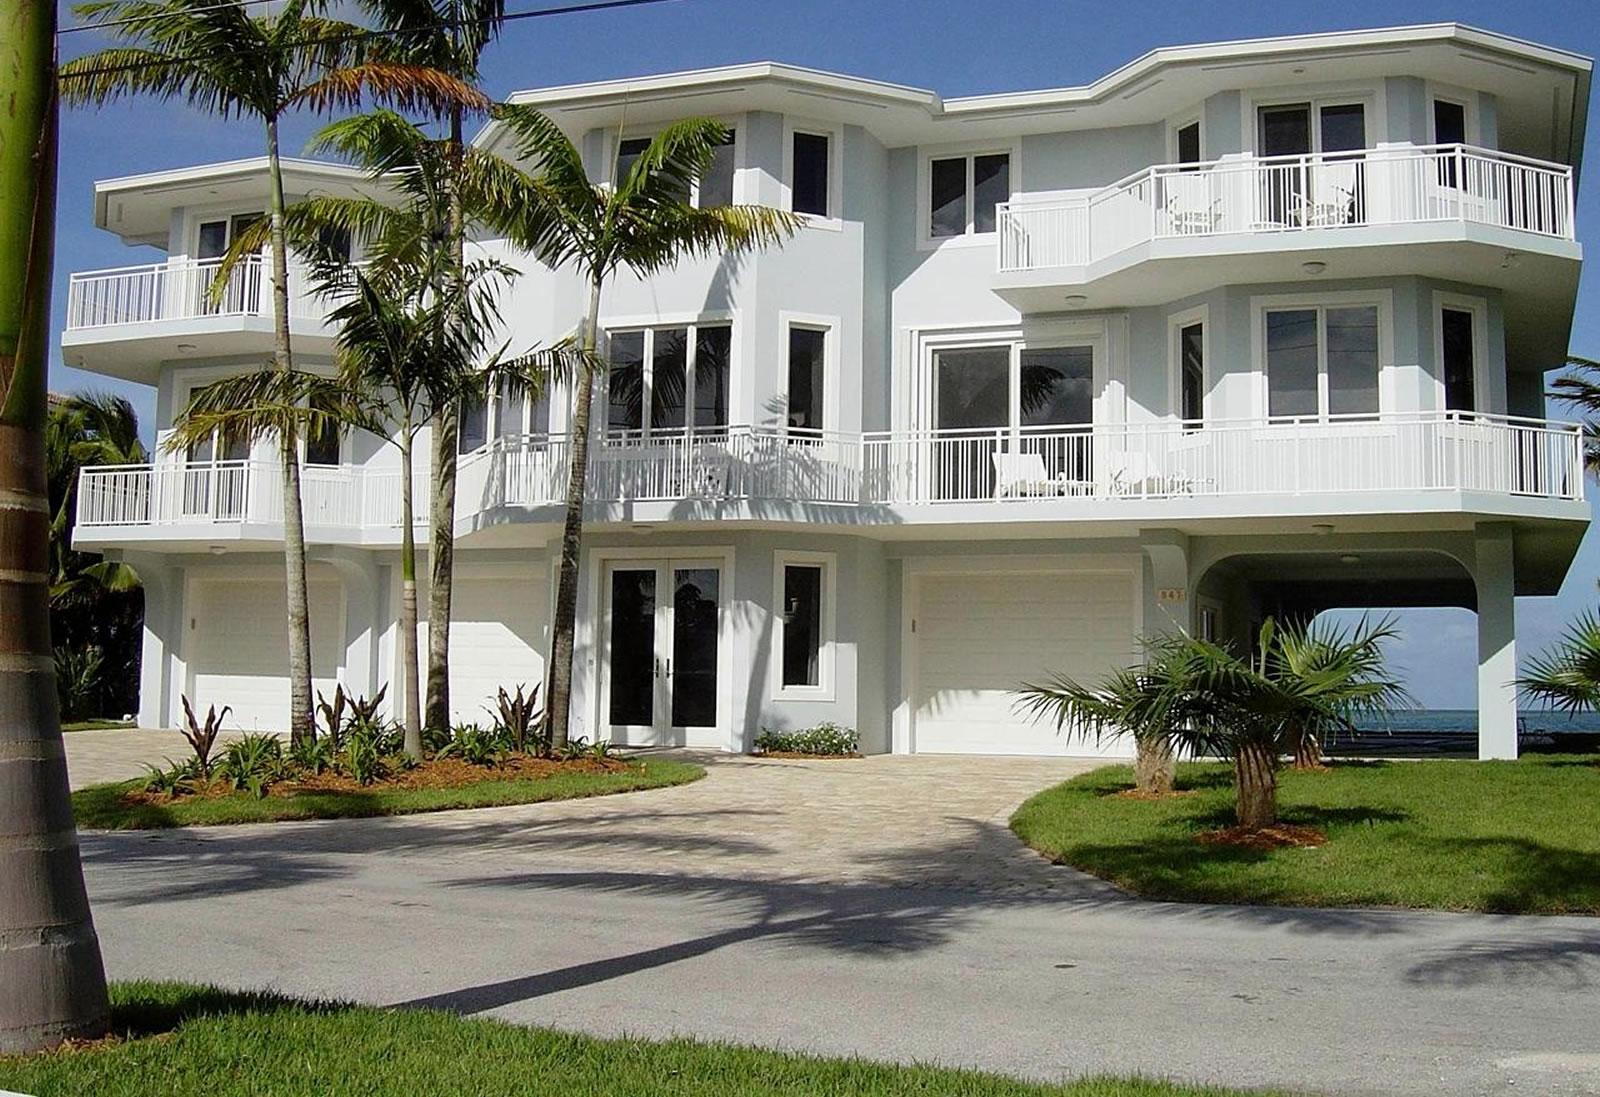 Hoefert & Sons - Florida Keys Contractors